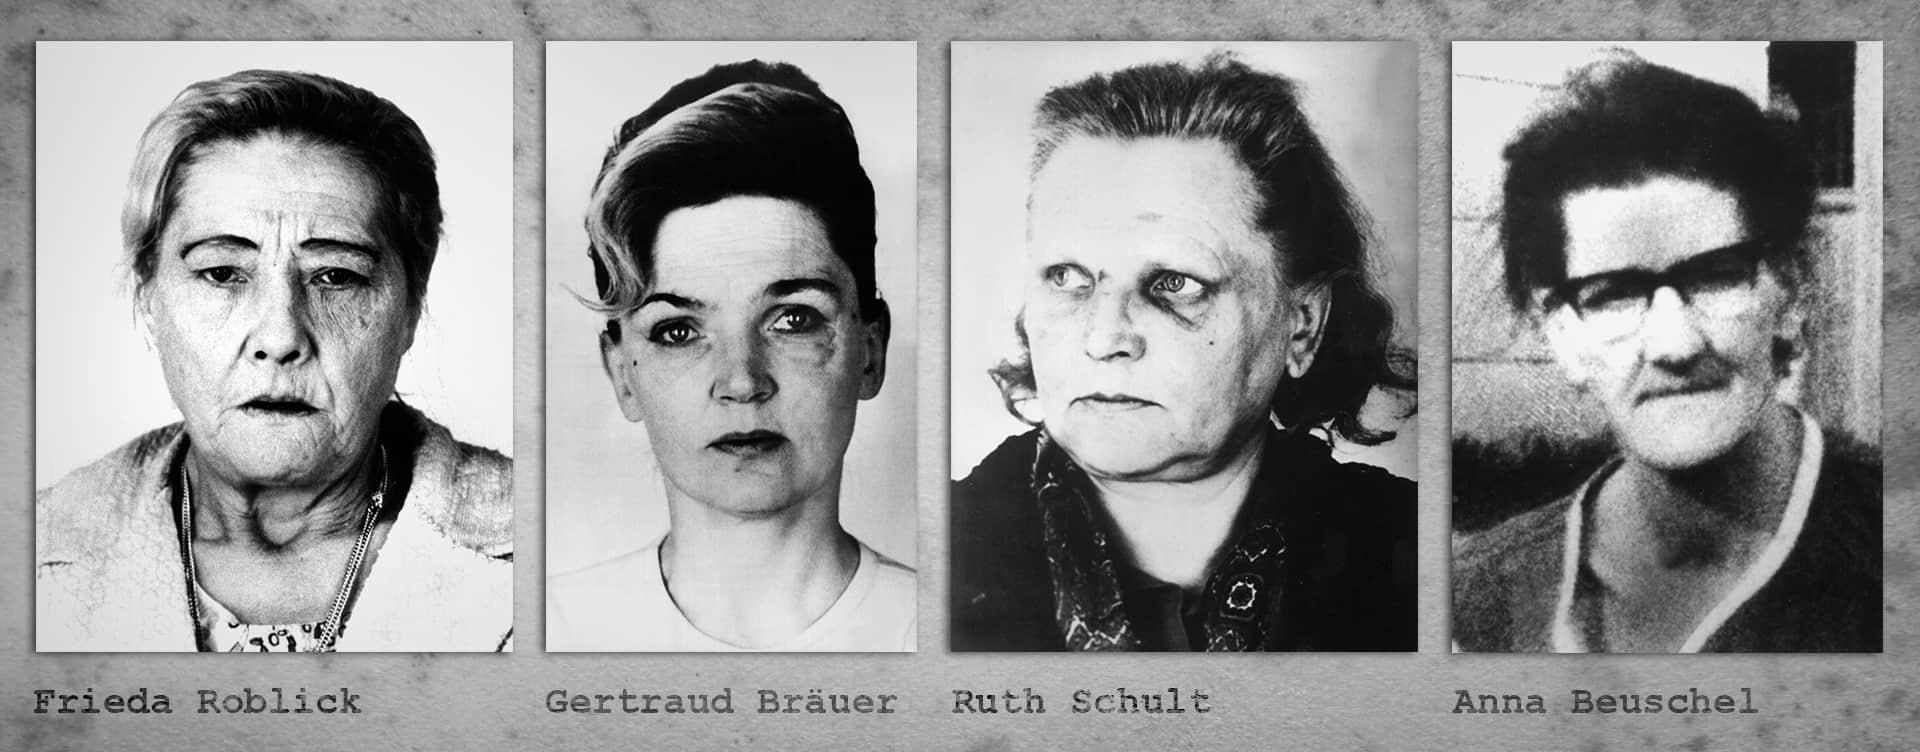 Fritz Honka   der brutale Serienmörder aus Hamburg   MENIFY ...